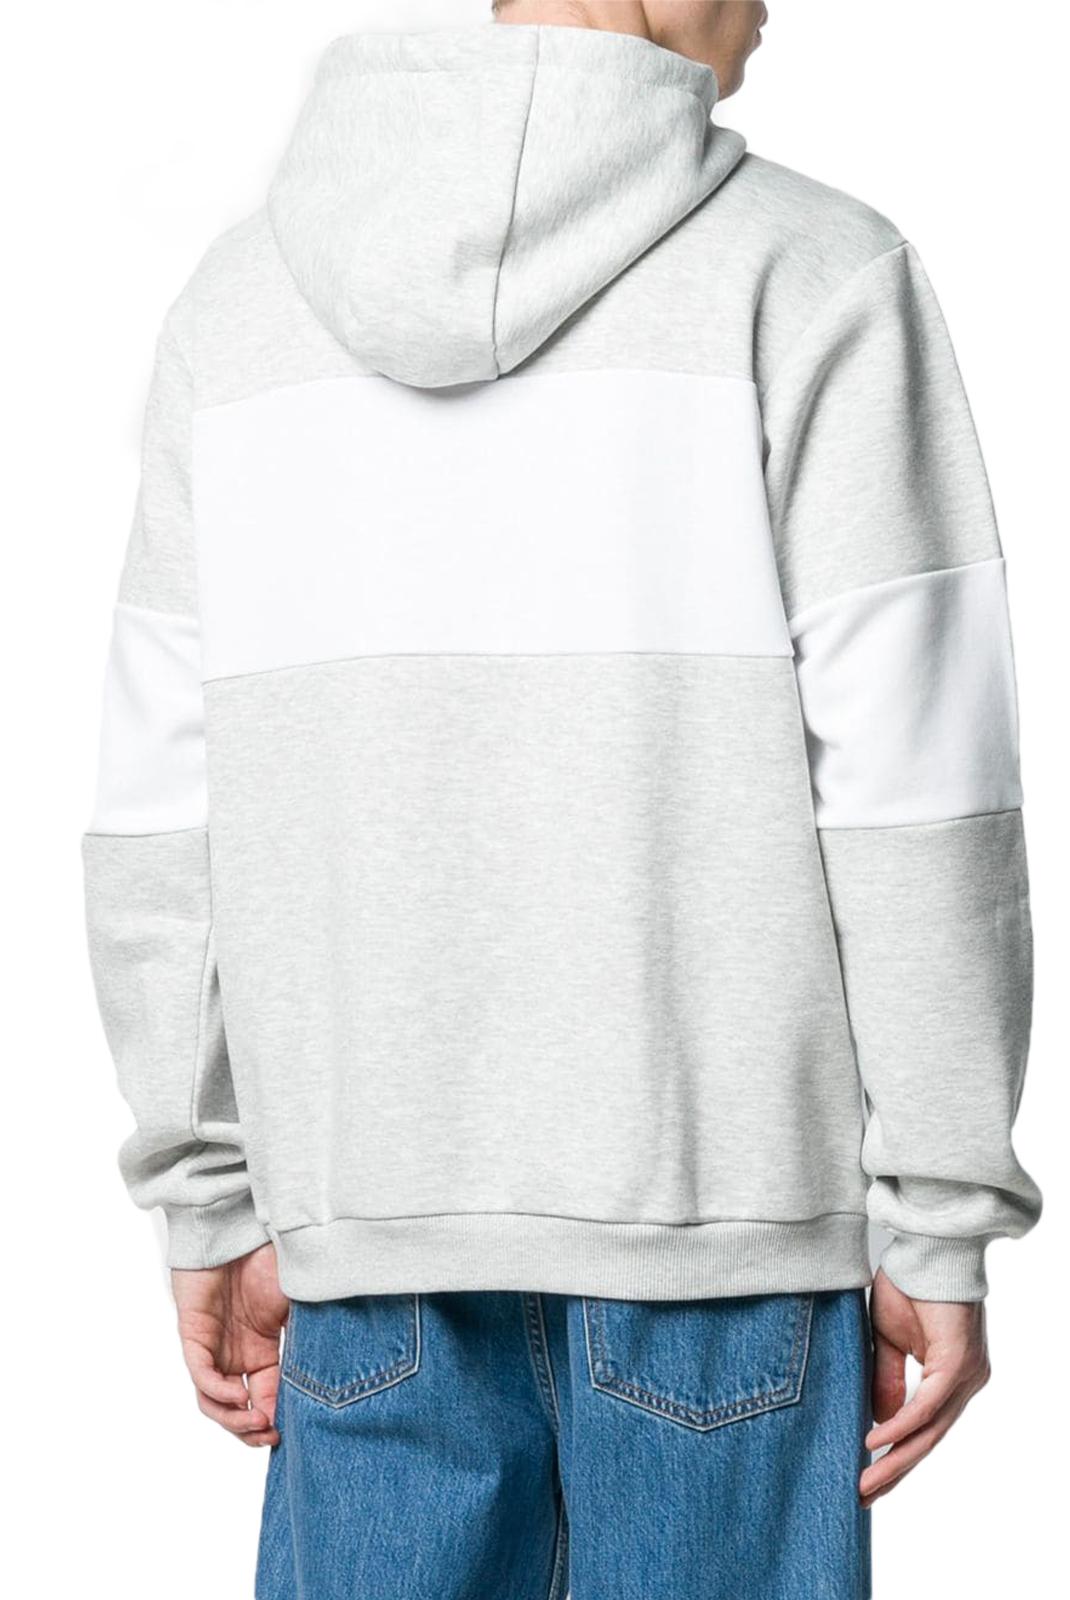 Pulls & Gilets  Fila 687001 A068 light grey mel bros-bright white